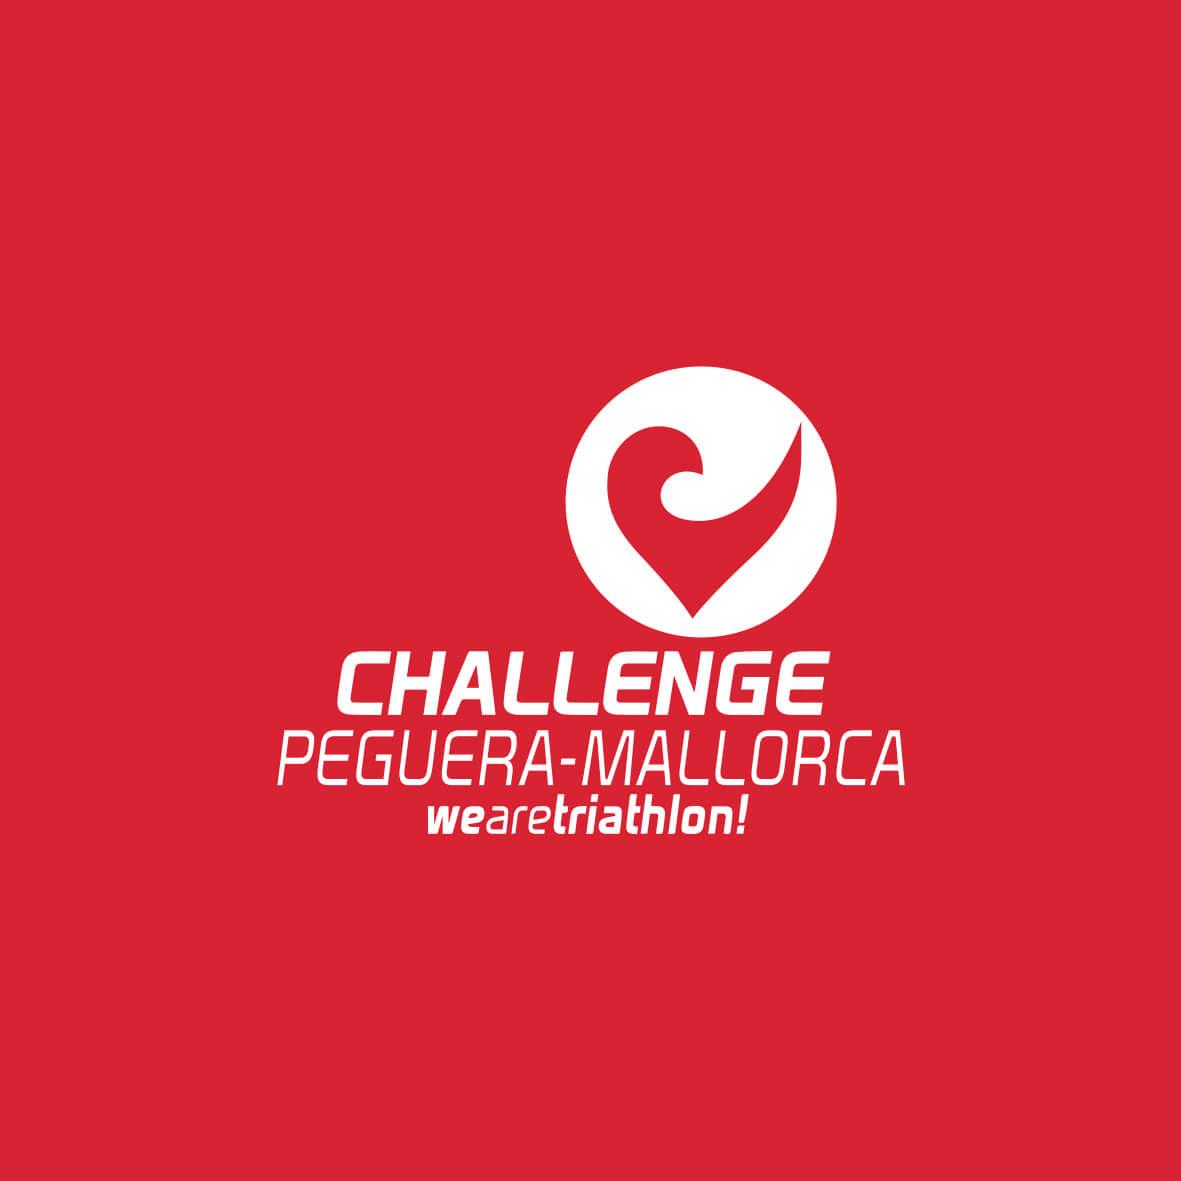 challenge mallorca, Half Marathon Magaluf, la mejor Media maratón en Mallorca, Half Marathon Magaluf, the best half distance marathon in Mallorca